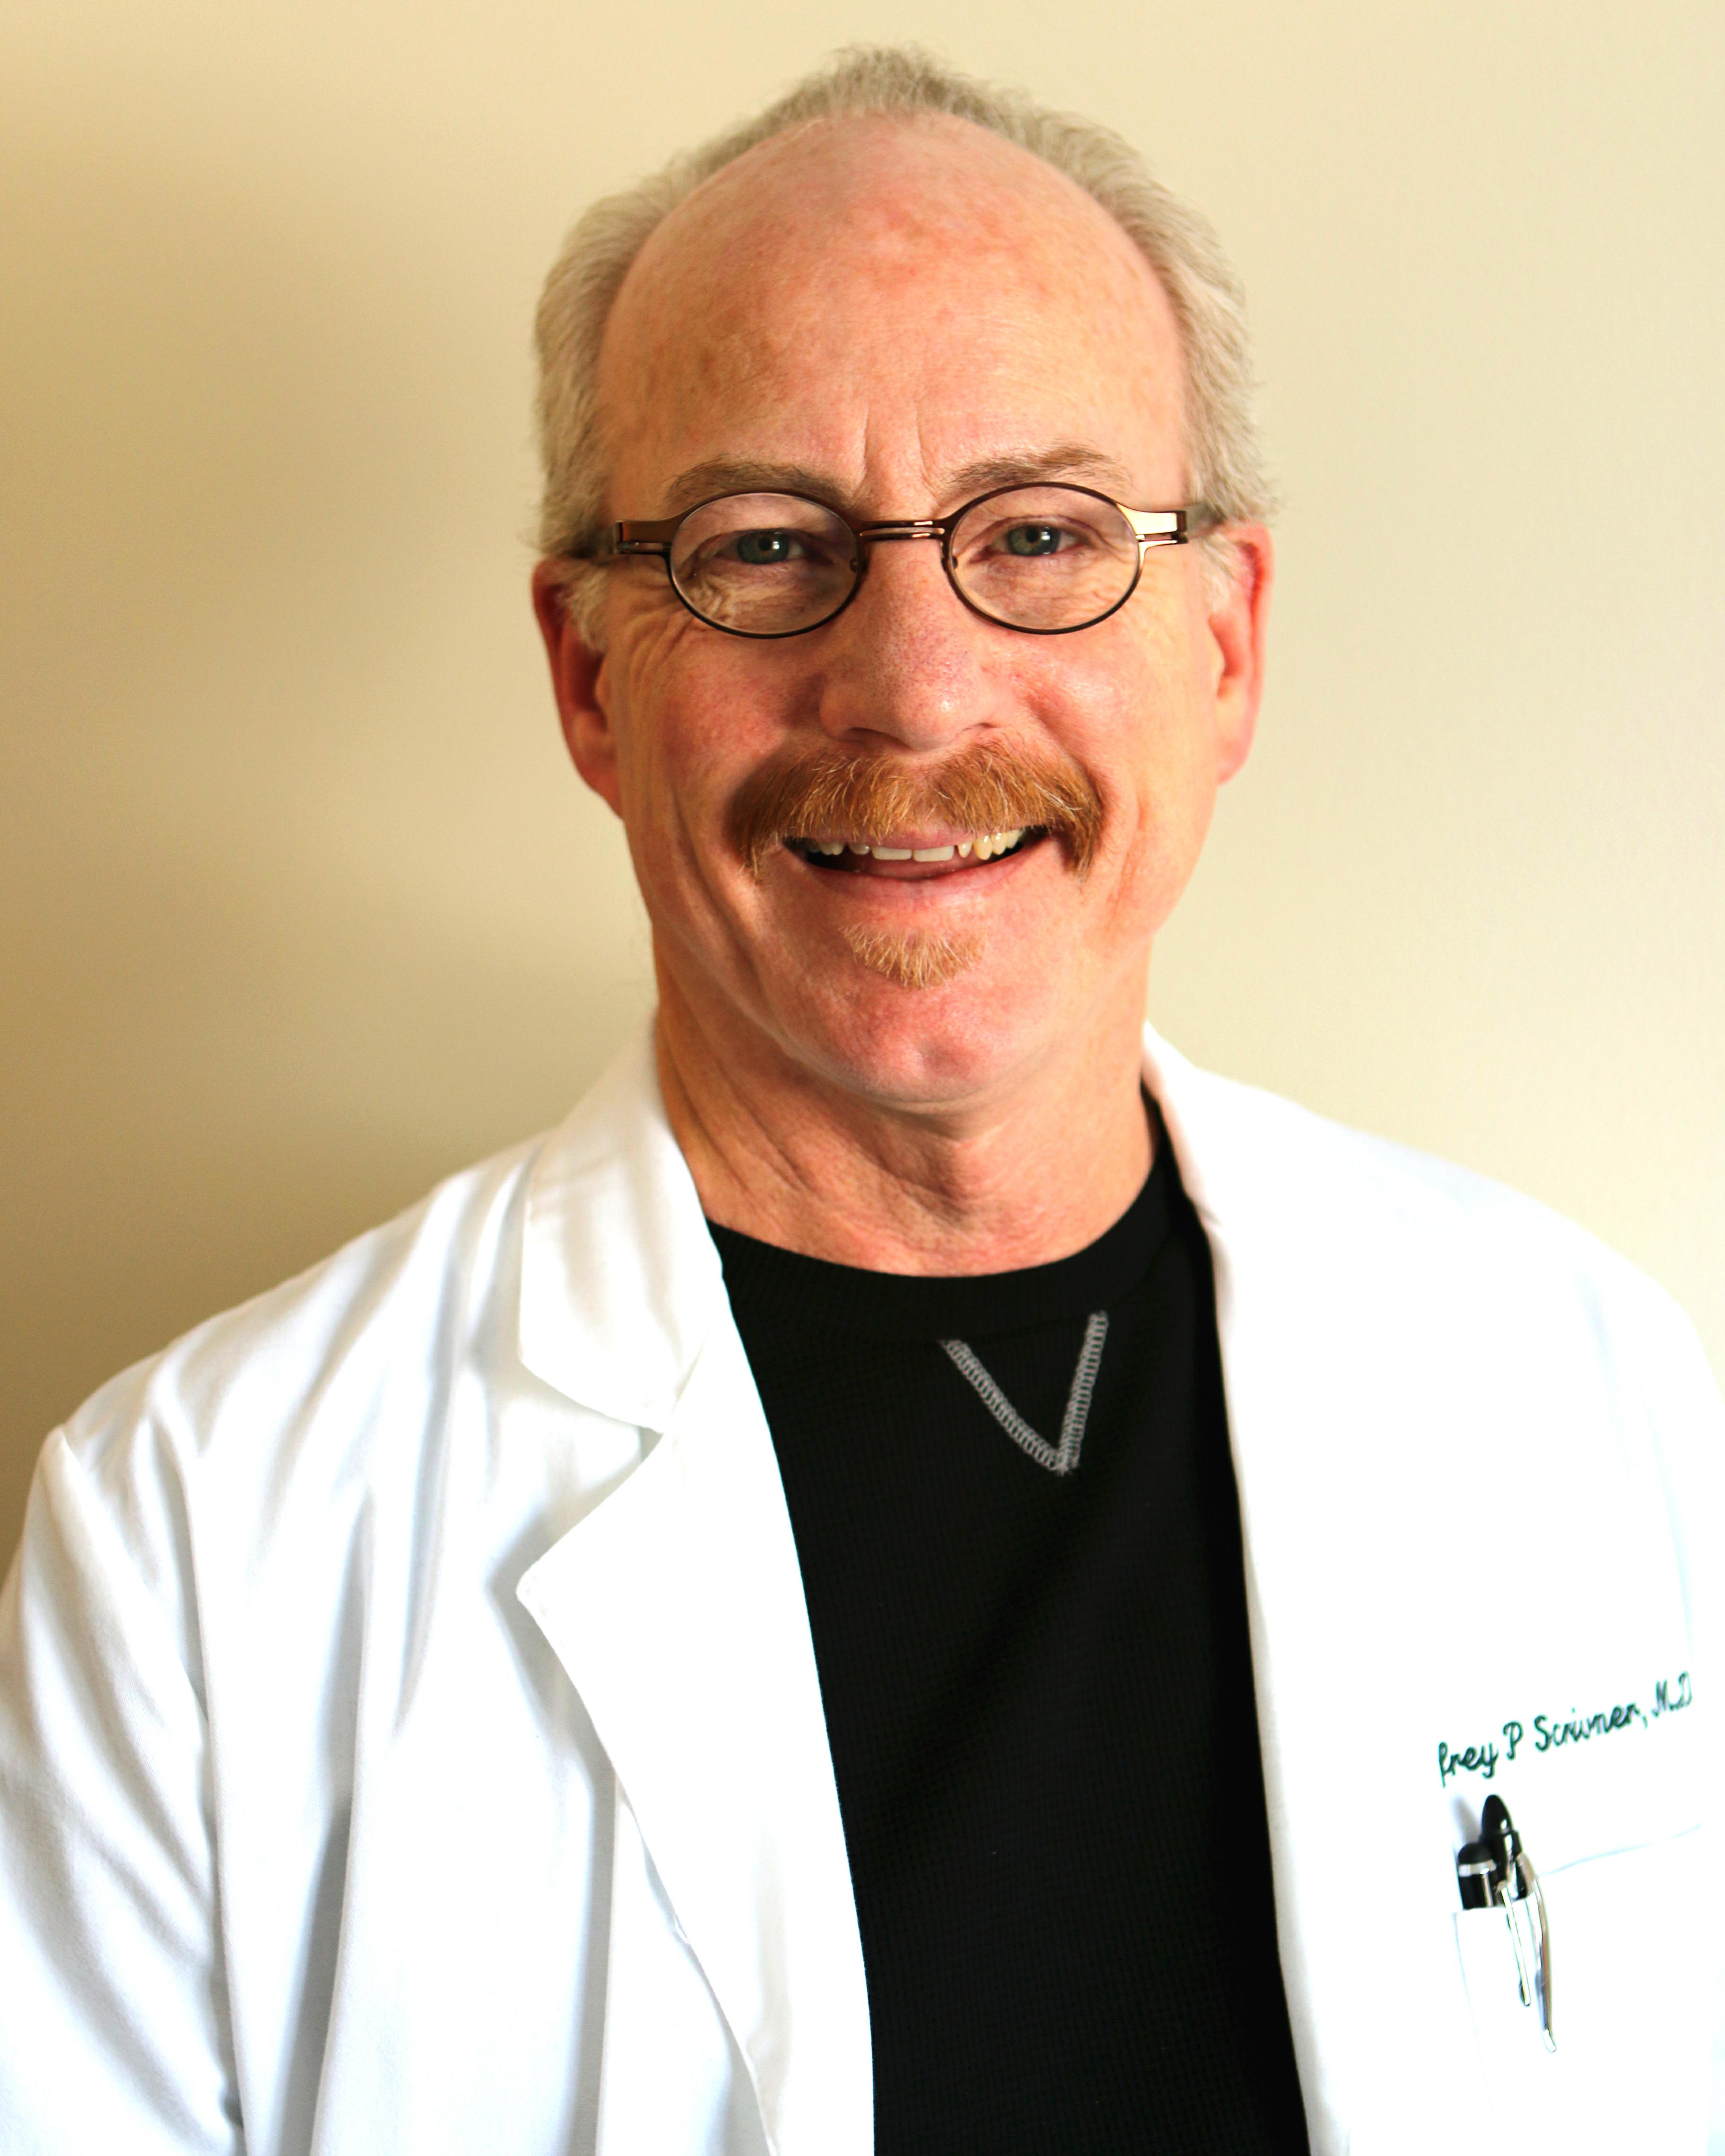 Jeffery Scrivner, MD